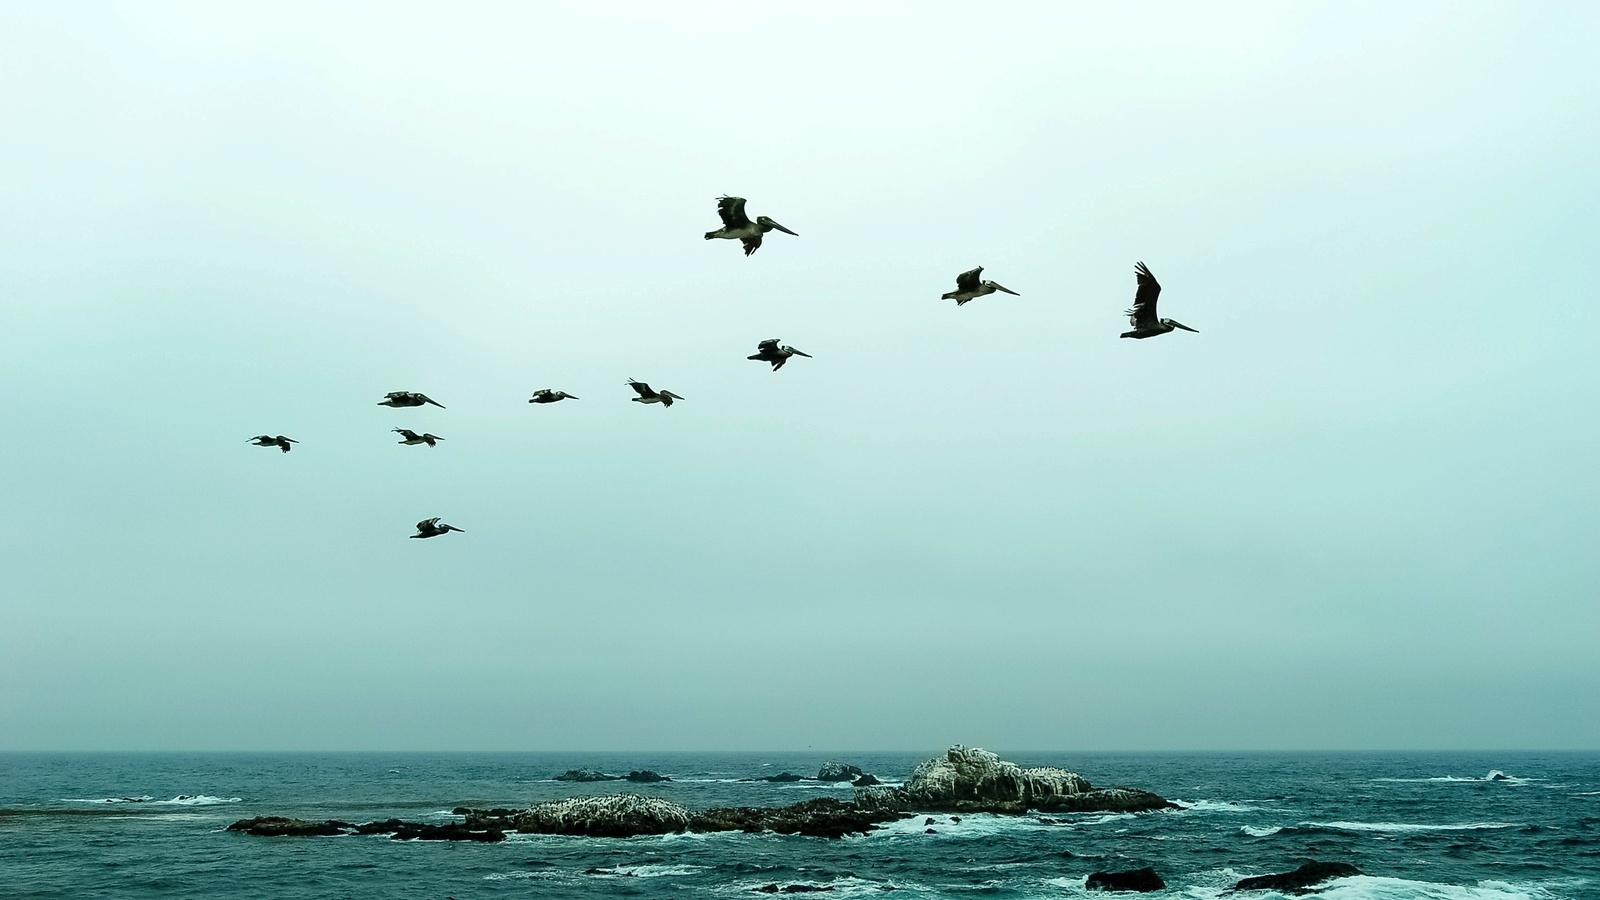 море, скалы, пеликаны